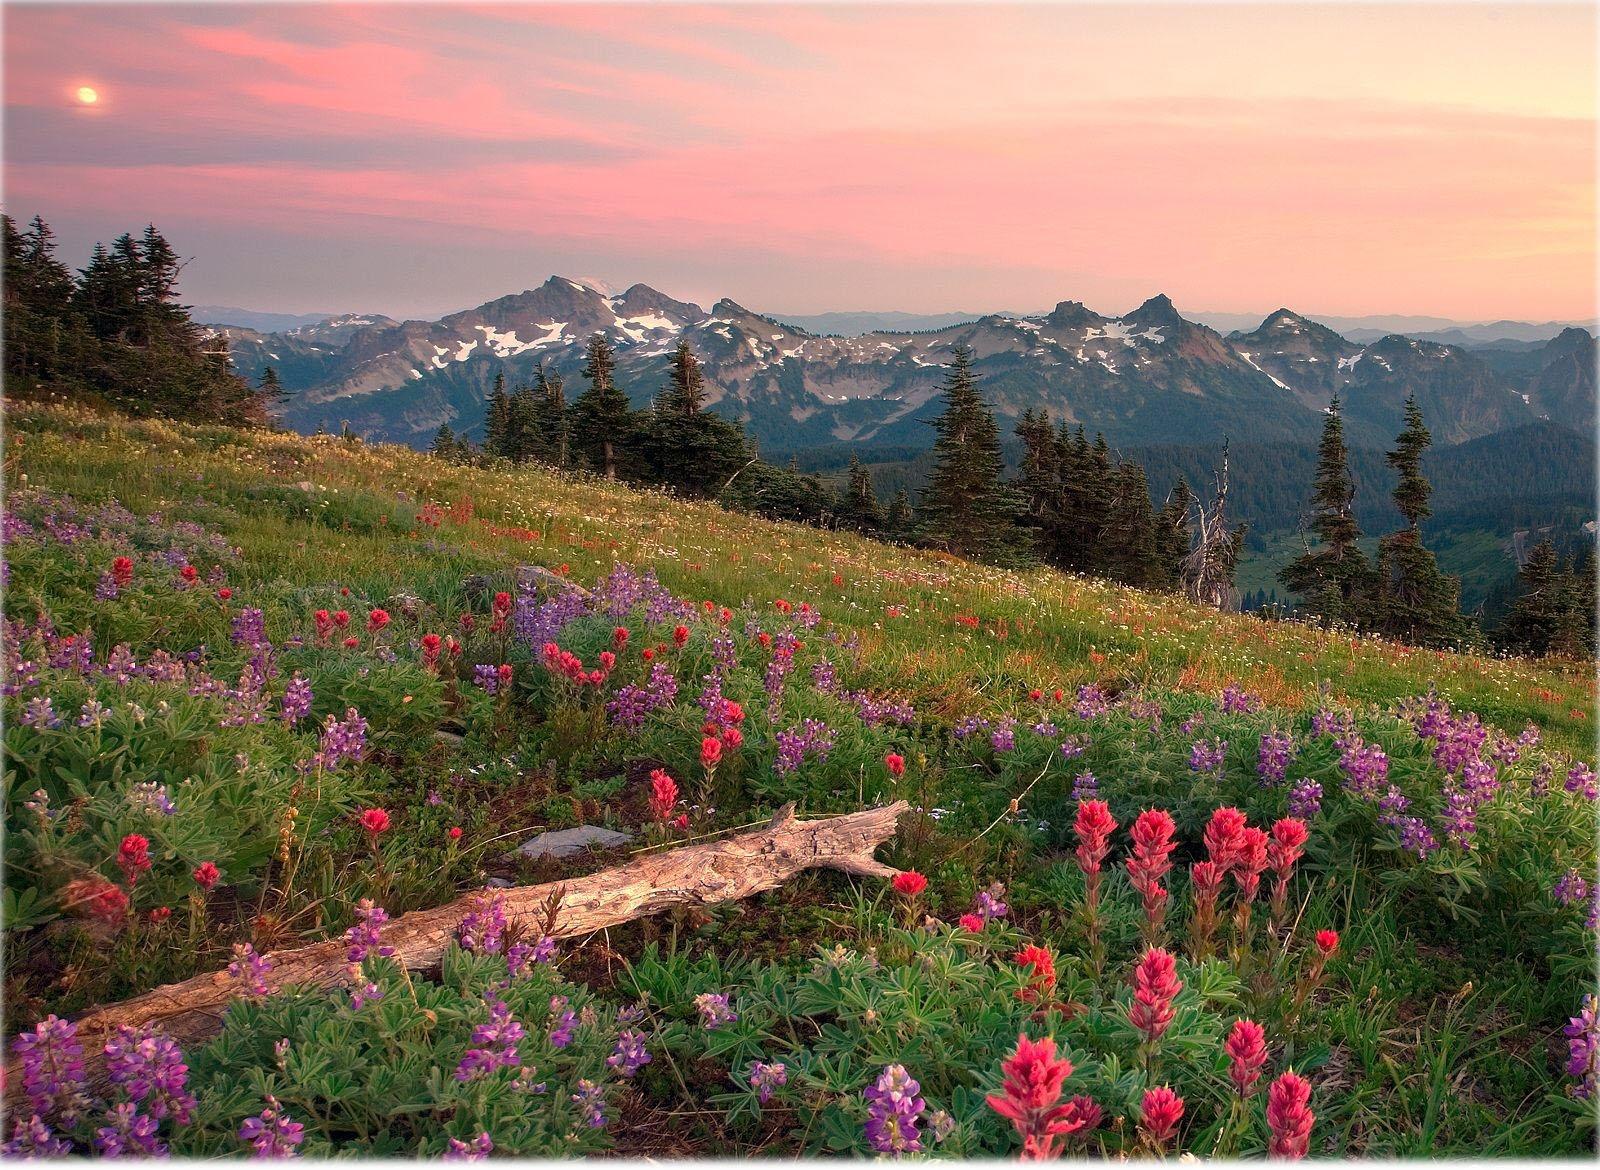 Natural Scenery Desktop Wallpaper - Mount Rainier - HD Wallpaper